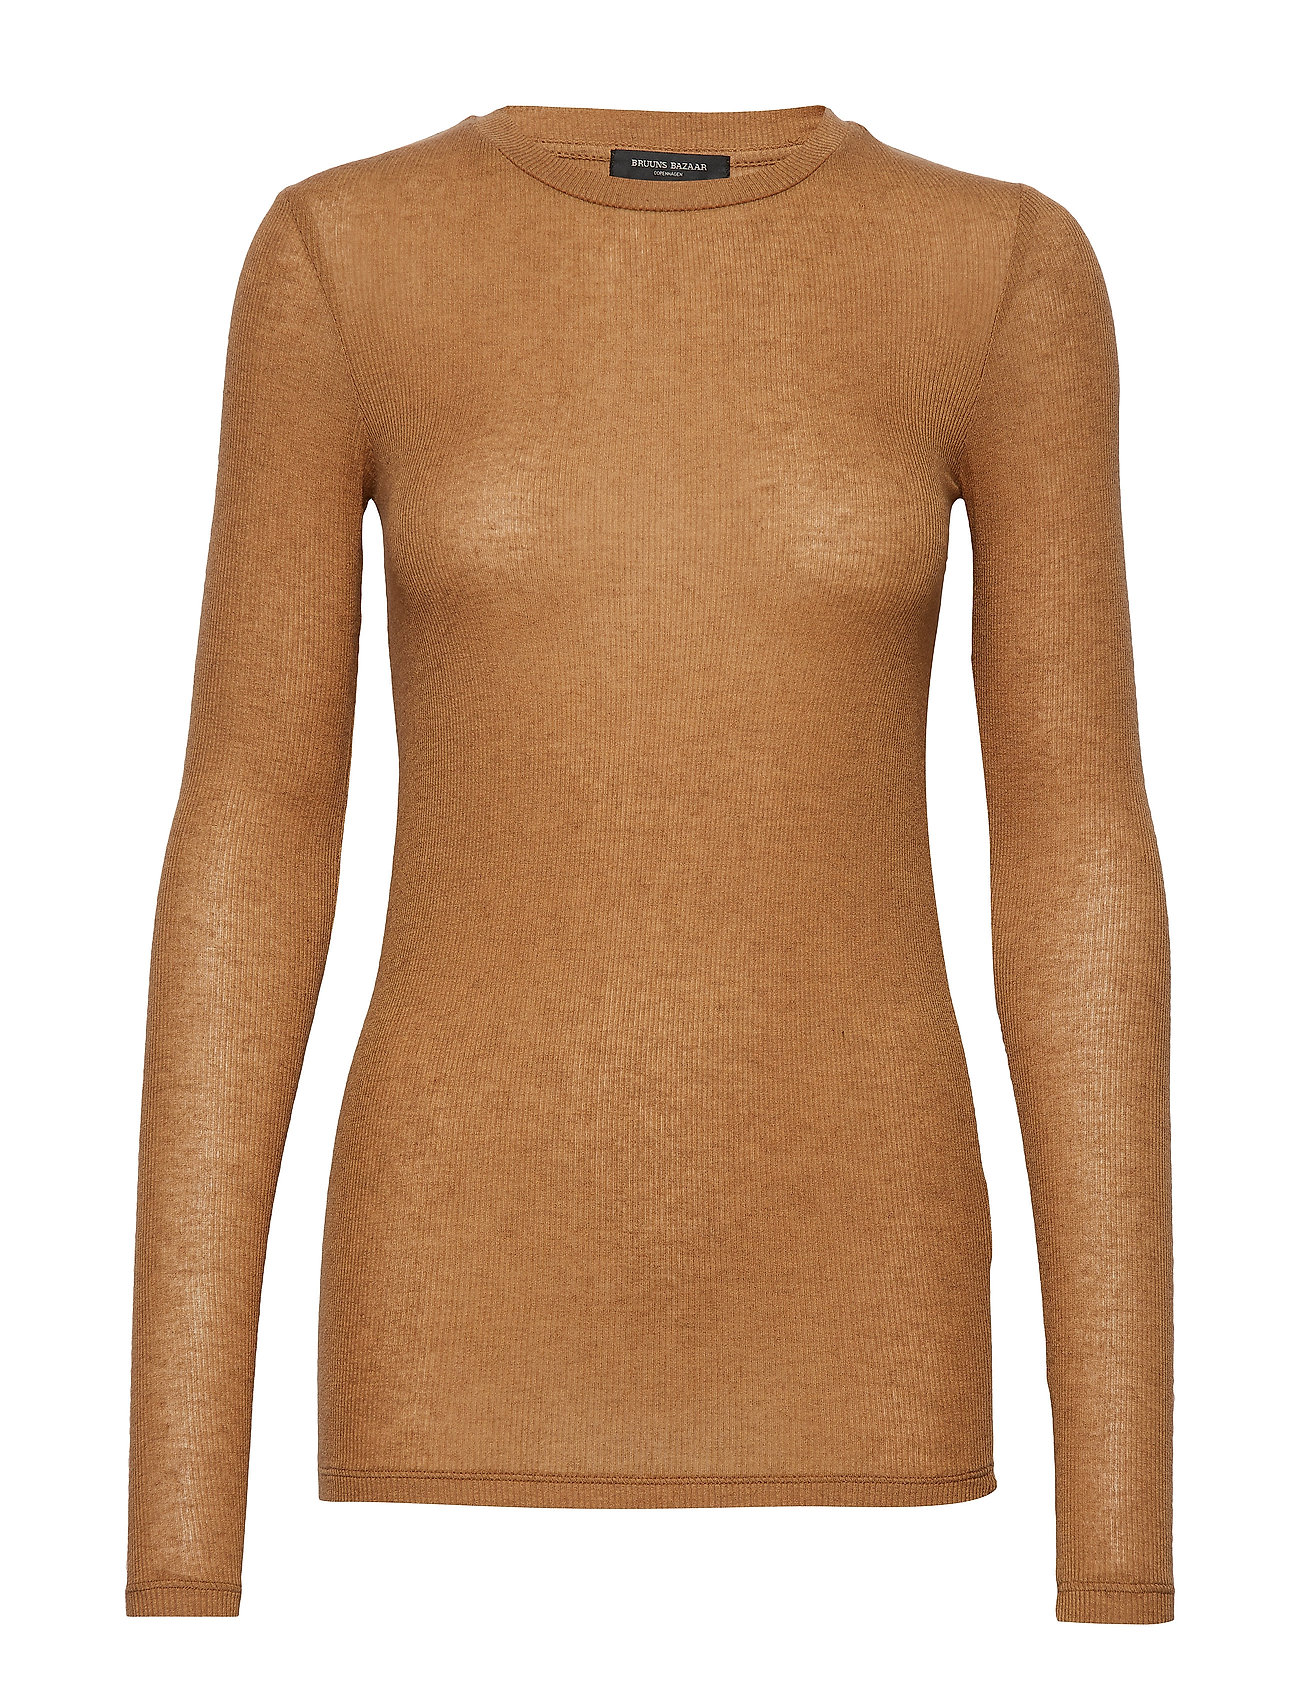 Bruuns Bazaar Angela LS T-shirt - OLD SAND